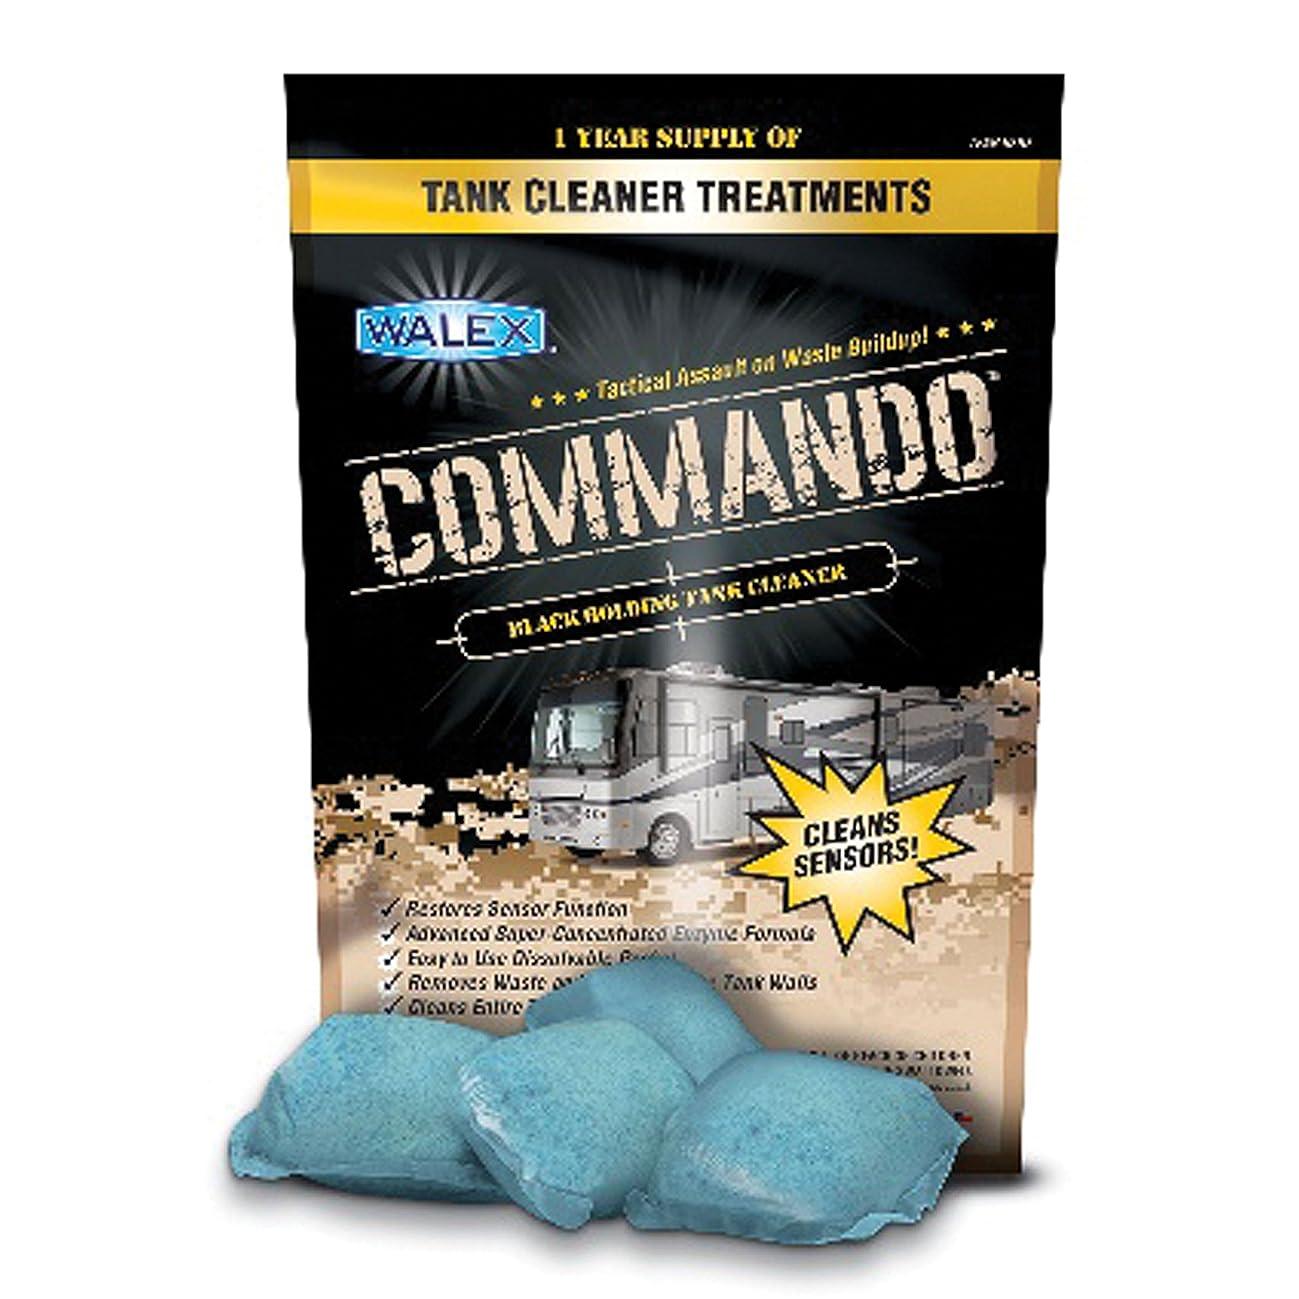 Walex CMDOBK Commando Black Tank Cleaner, 40 Pack Drop-Ins